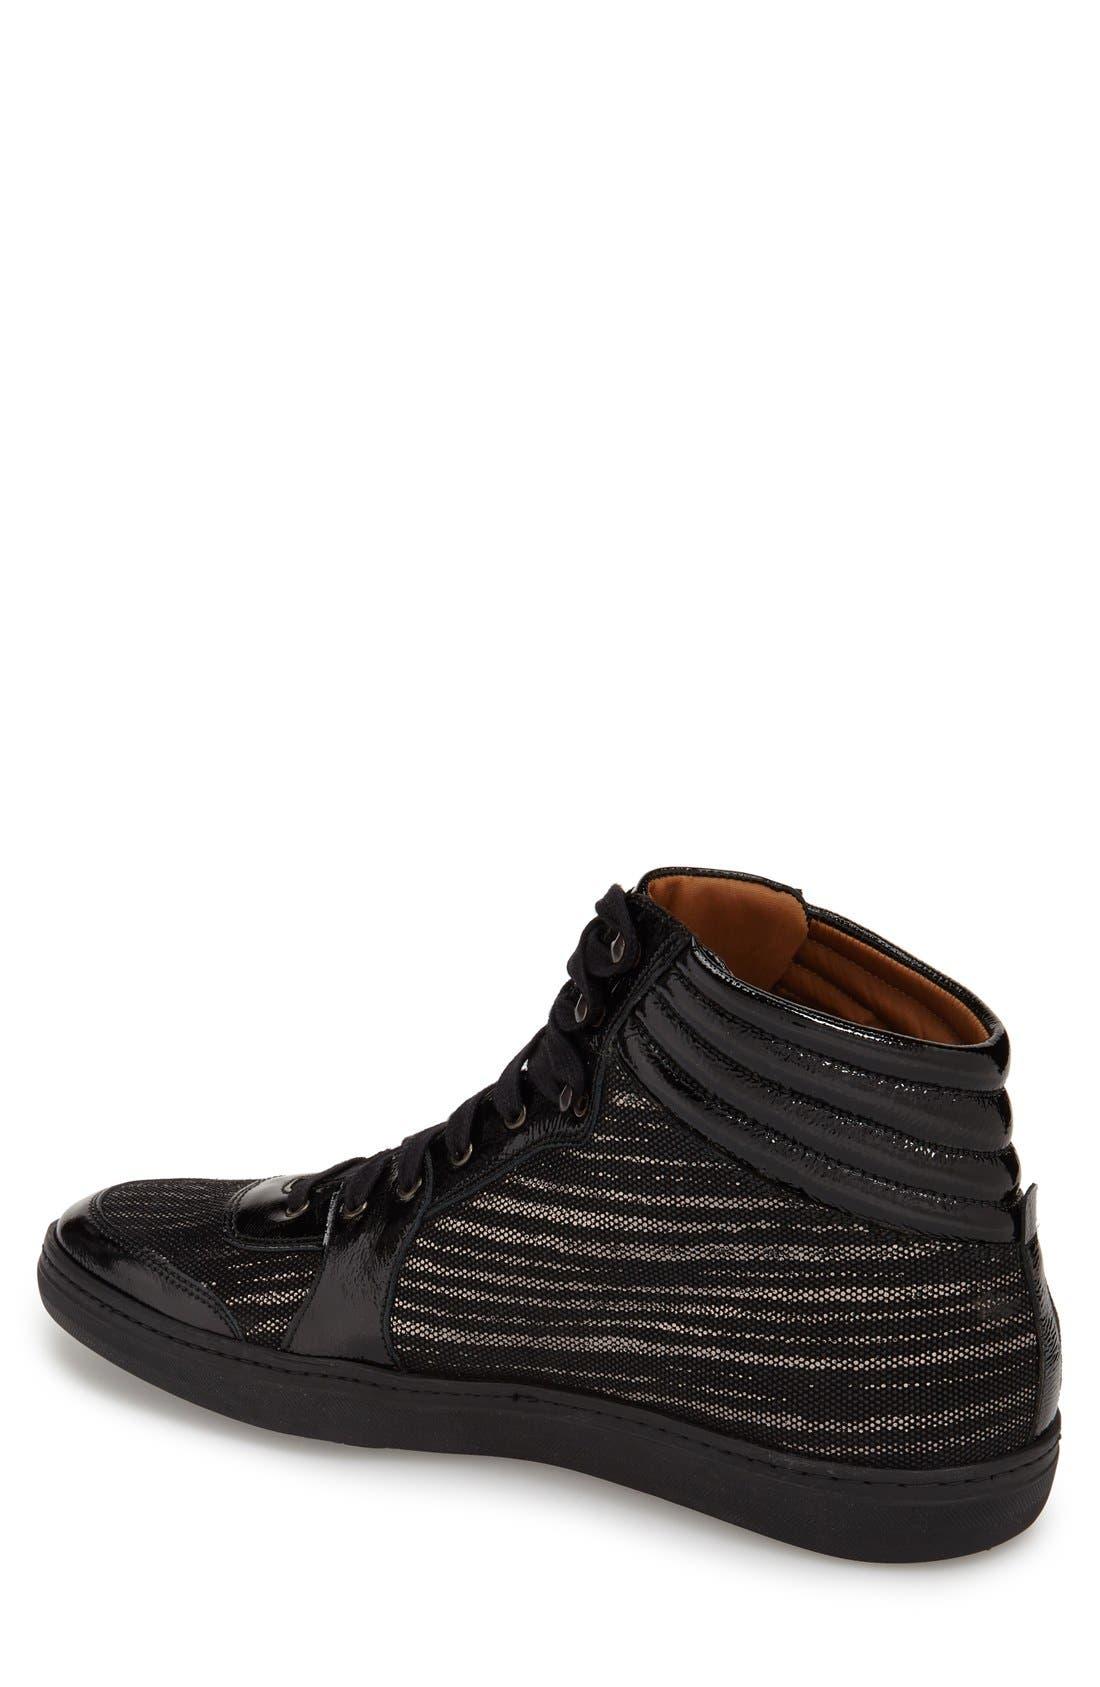 'Bordeau' Sneaker,                             Alternate thumbnail 2, color,                             Black